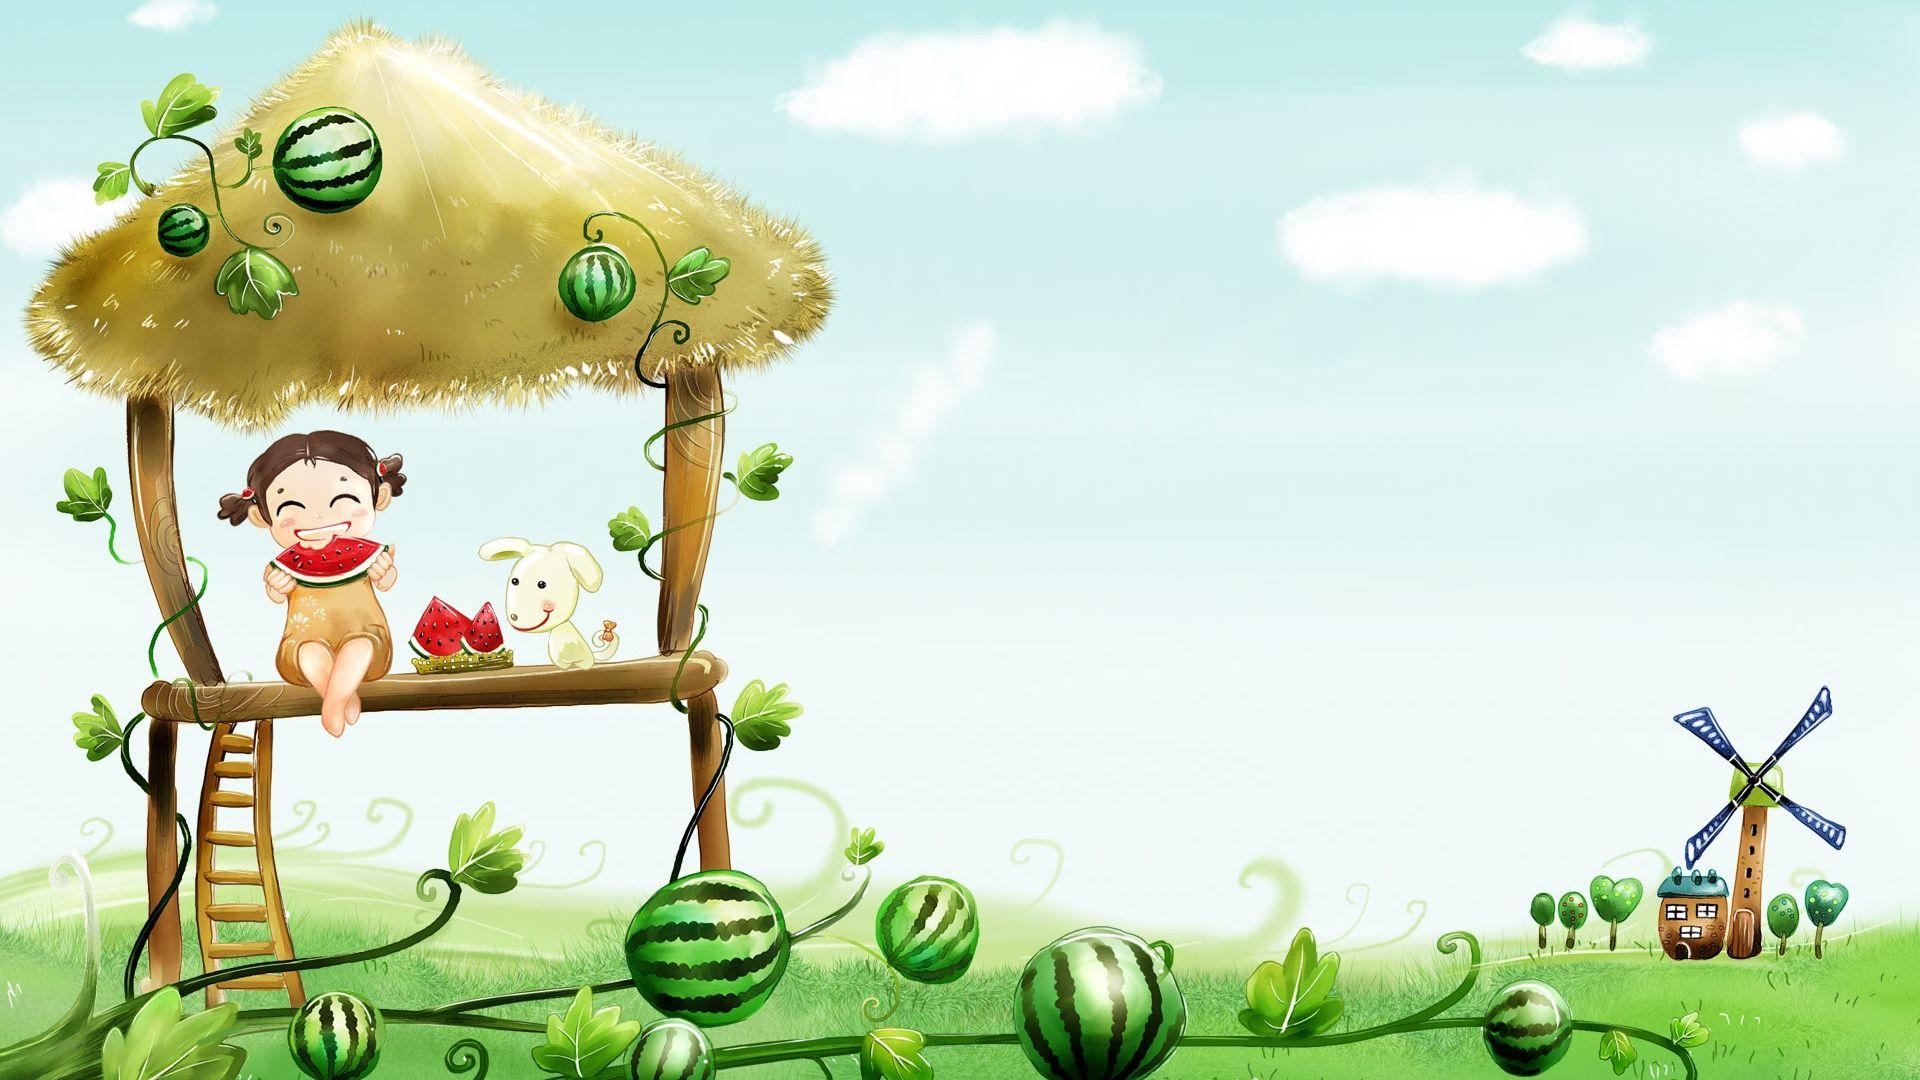 Download Wallpaper 1920x1080 Girl Dog Watermelon Food Garden Mill Full Hd 1080p Hd Backgrou Cartoon Wallpaper Hd Cartoon Wallpaper Cute Cartoon Wallpapers